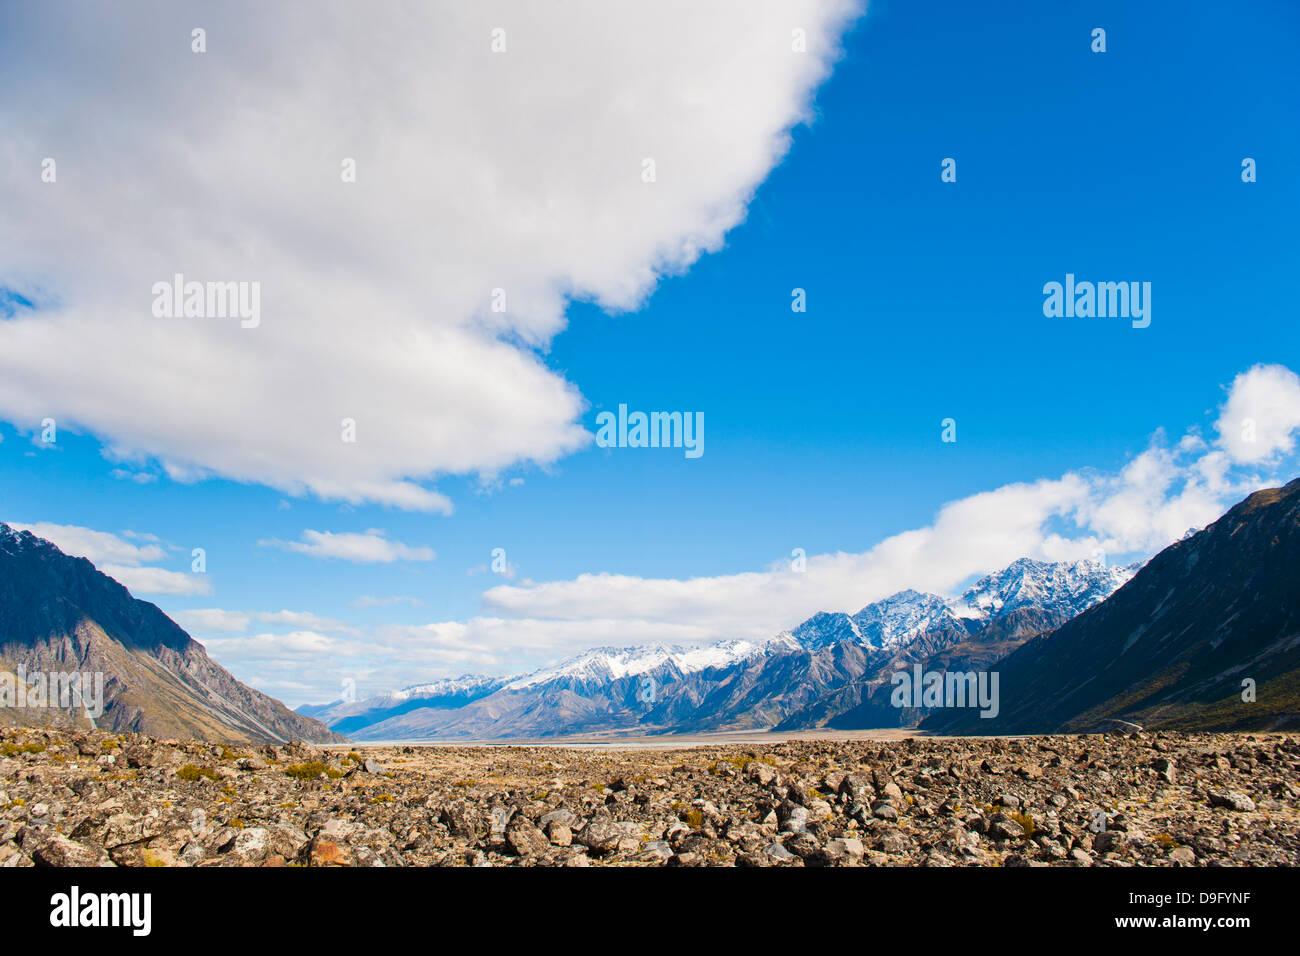 Mountain scenery and mountain, Aoraki Mount Cook National Park, UNESCO World Heritage Site, South Island, New Zealand - Stock Image